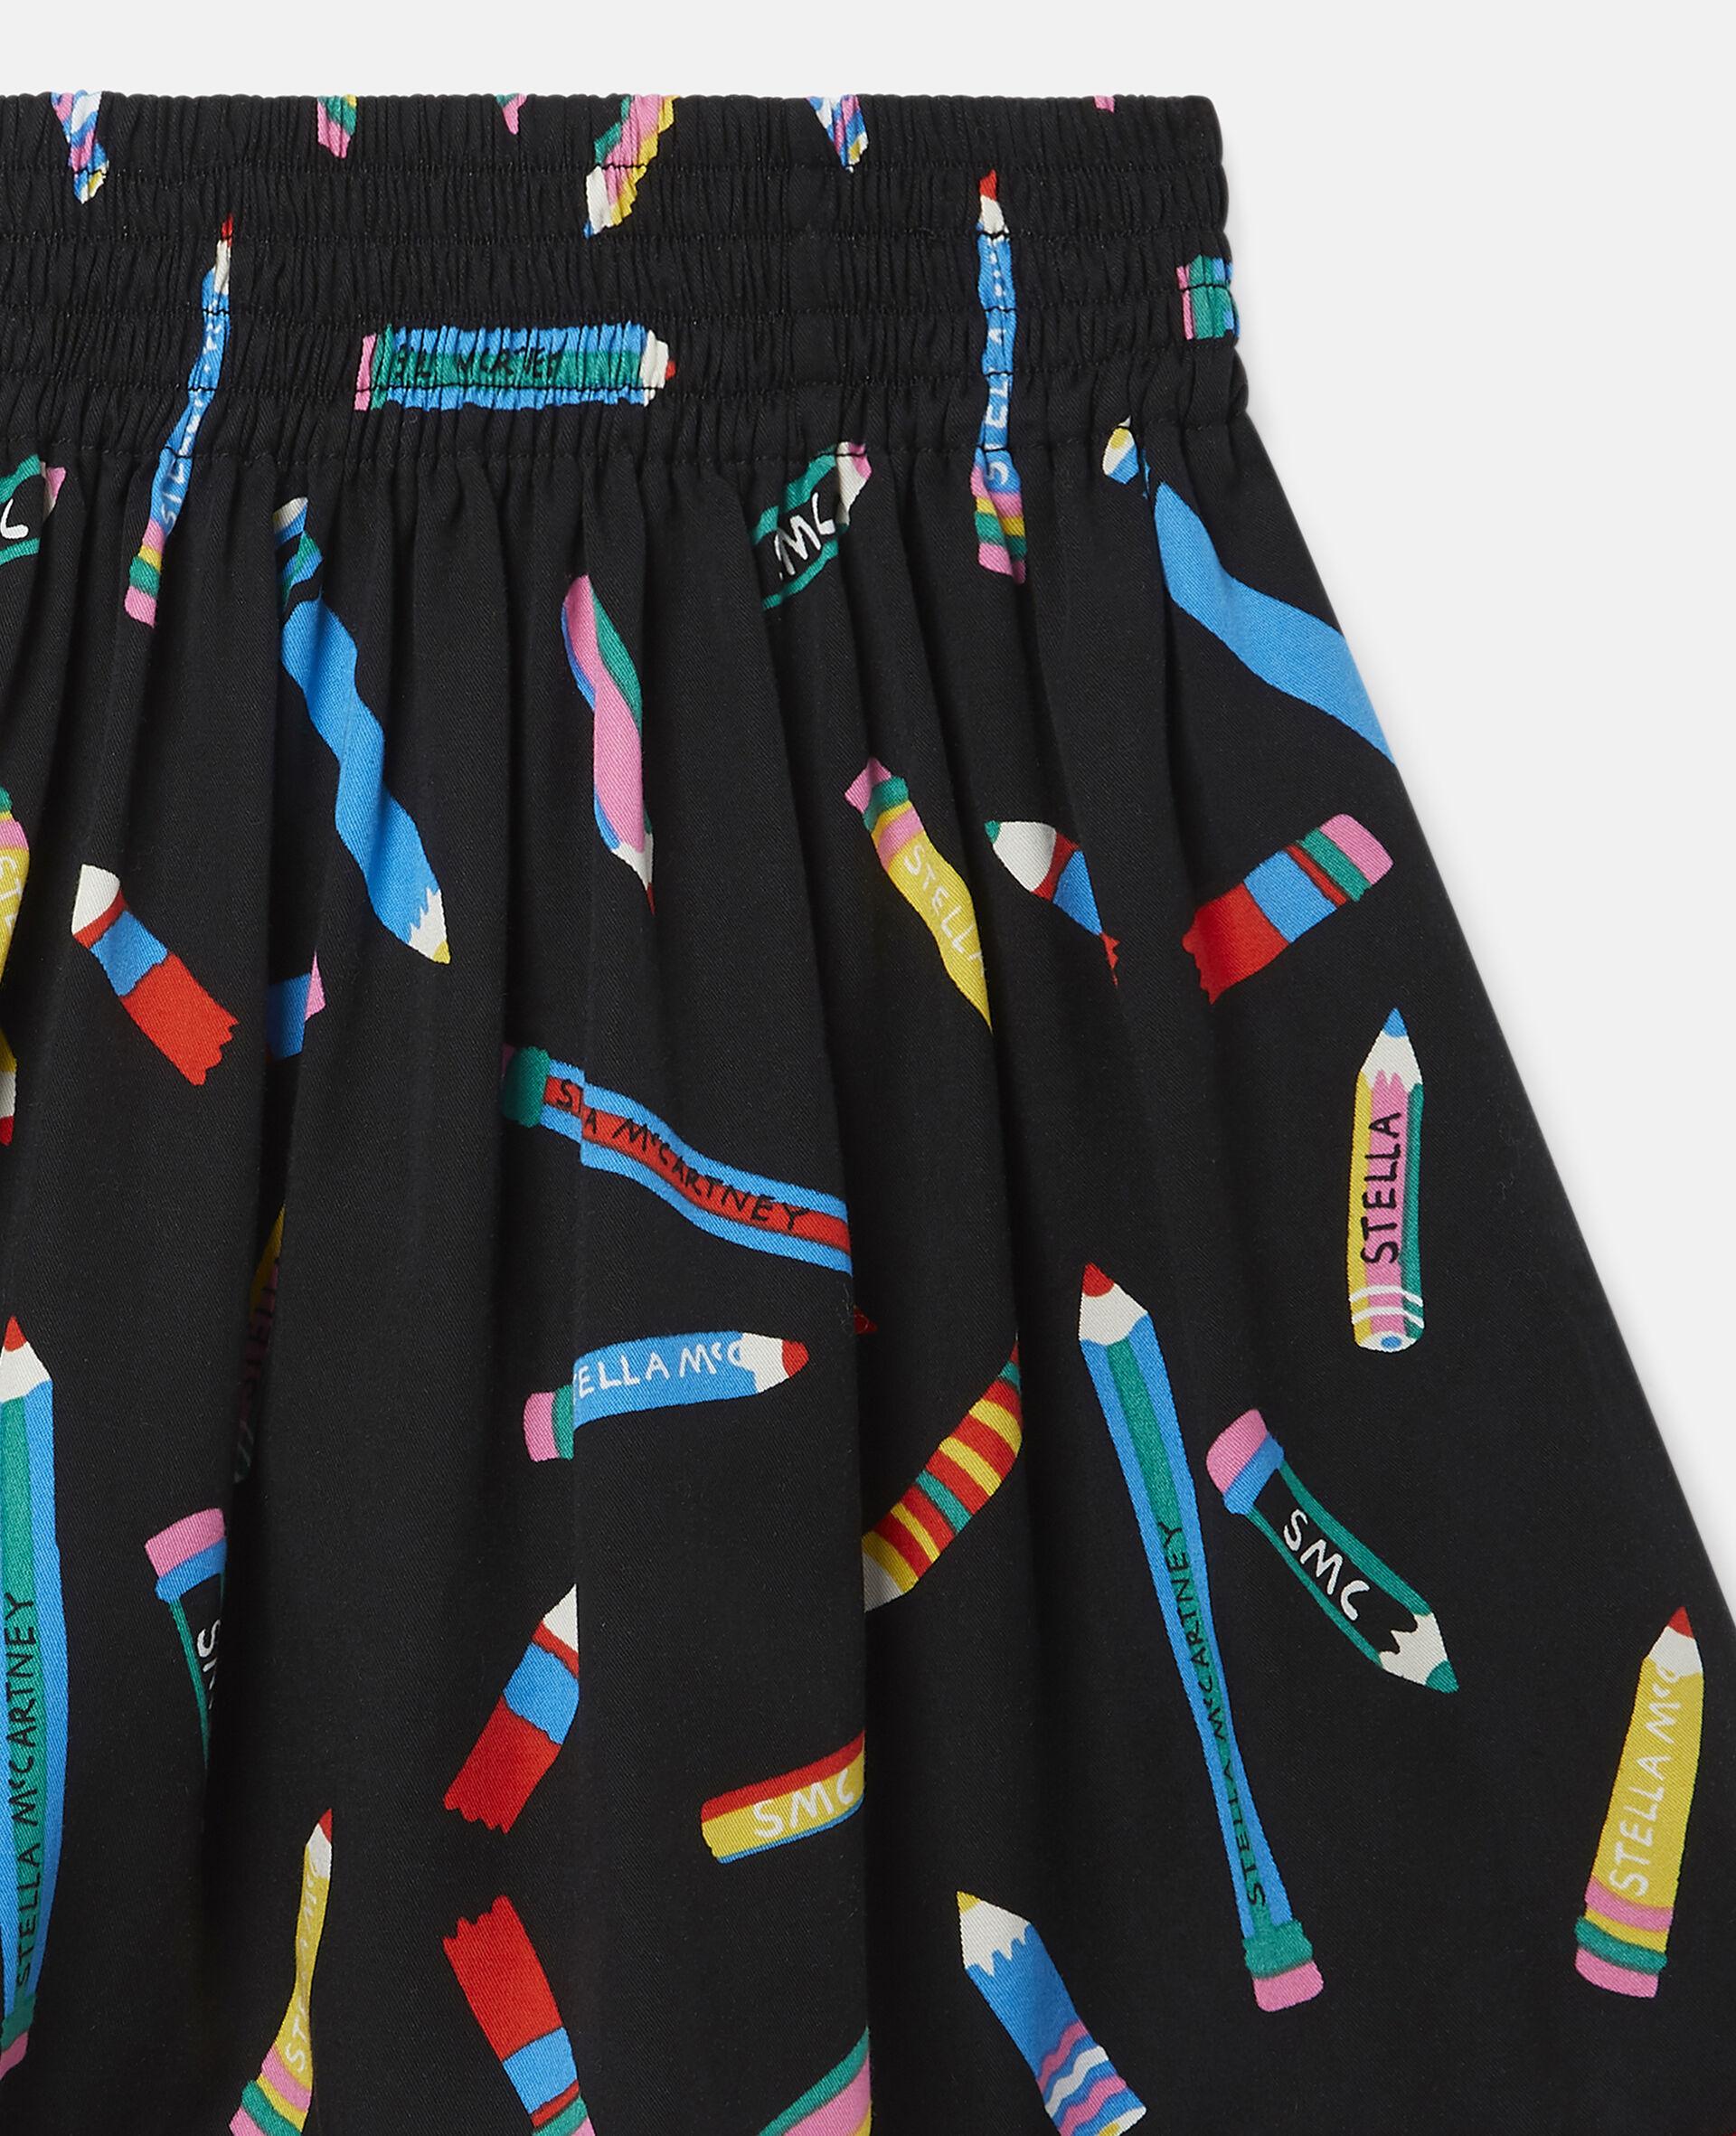 铅笔印花斜纹布半身裙 -黑色-large image number 1